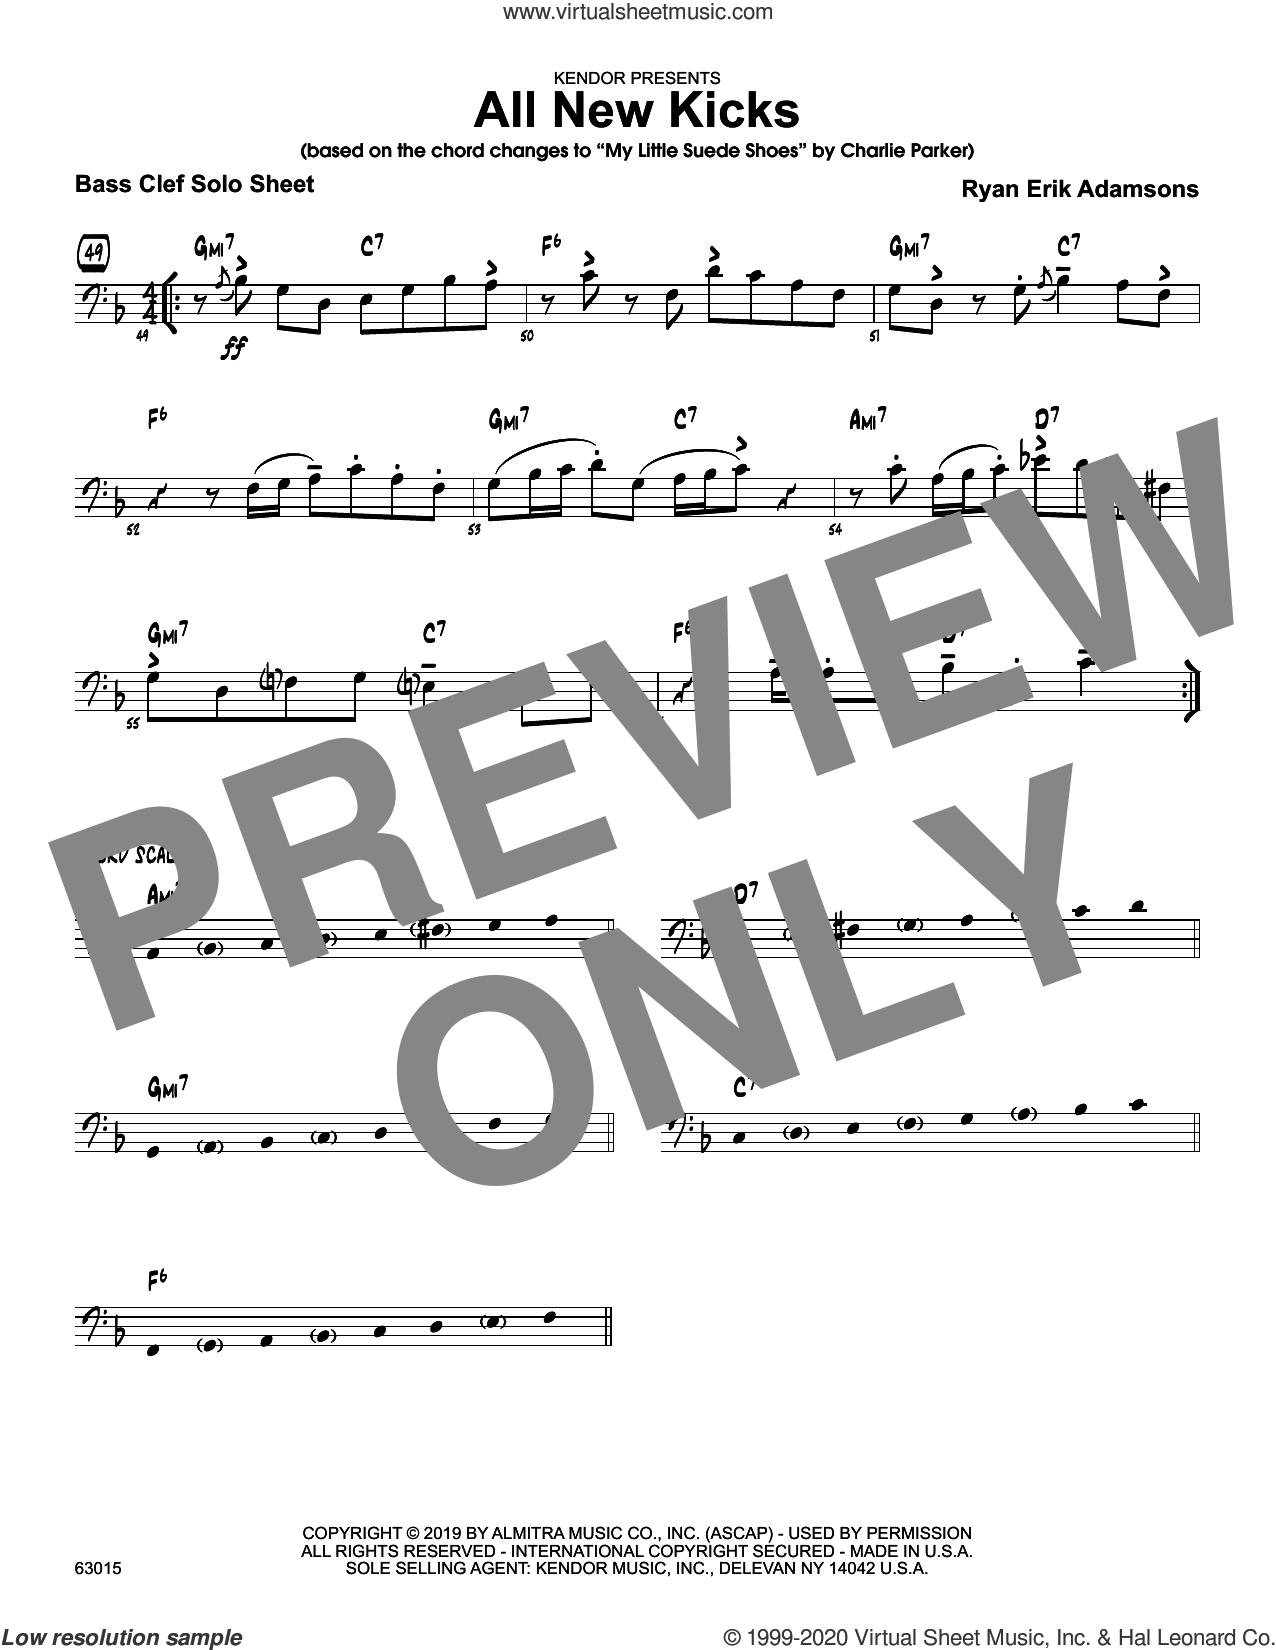 All New Kicks, solo sheet sheet music for jazz band (solo sheet - trombone) by Ryan Erik Adamsons, intermediate skill level